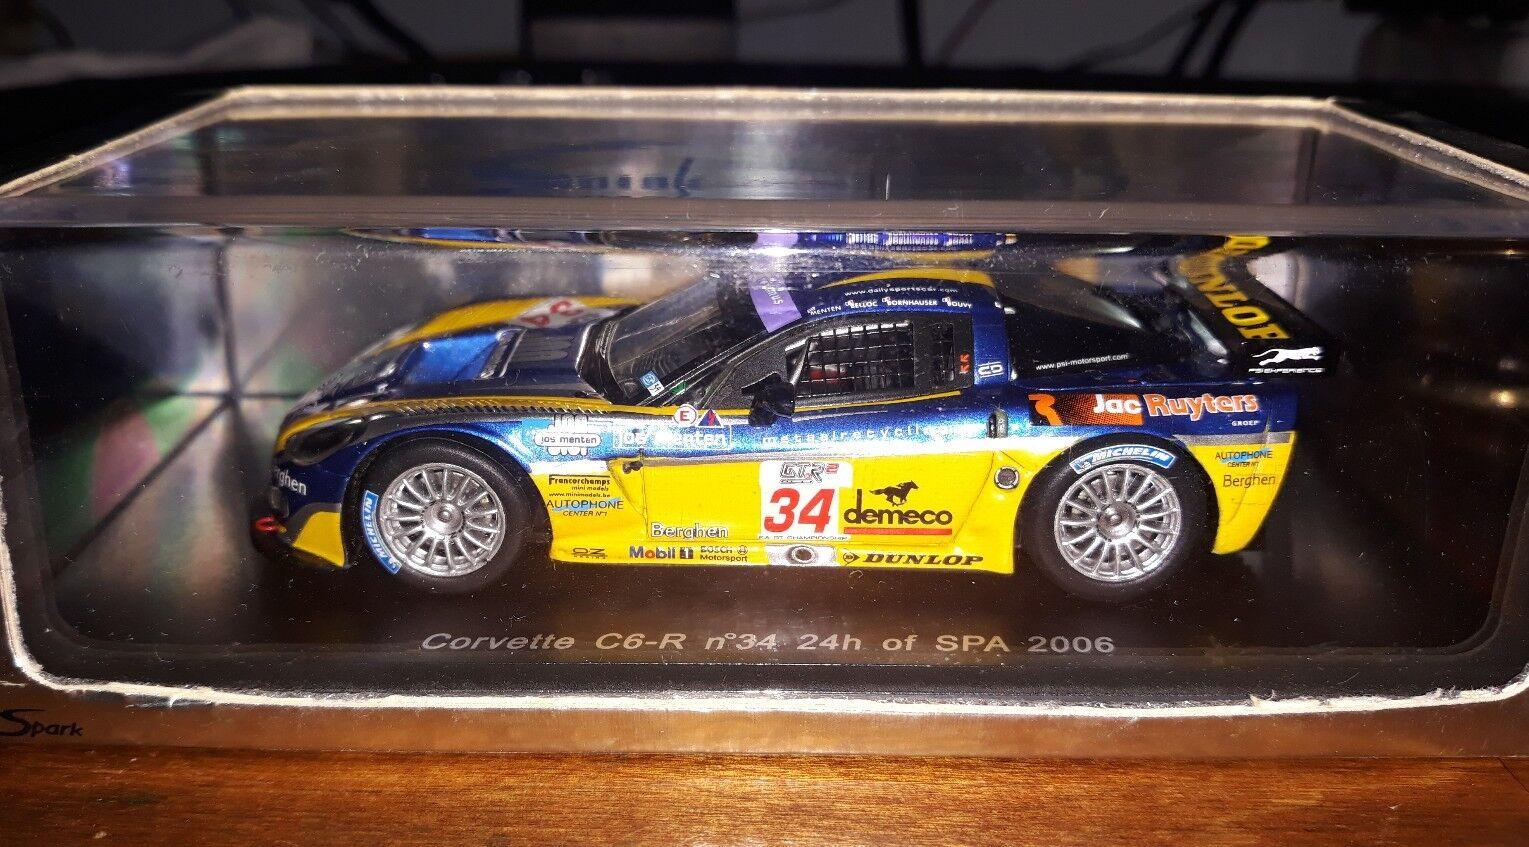 Spark 1 43 Corvette C6R  34 24 hours of Spa 2006 S0177